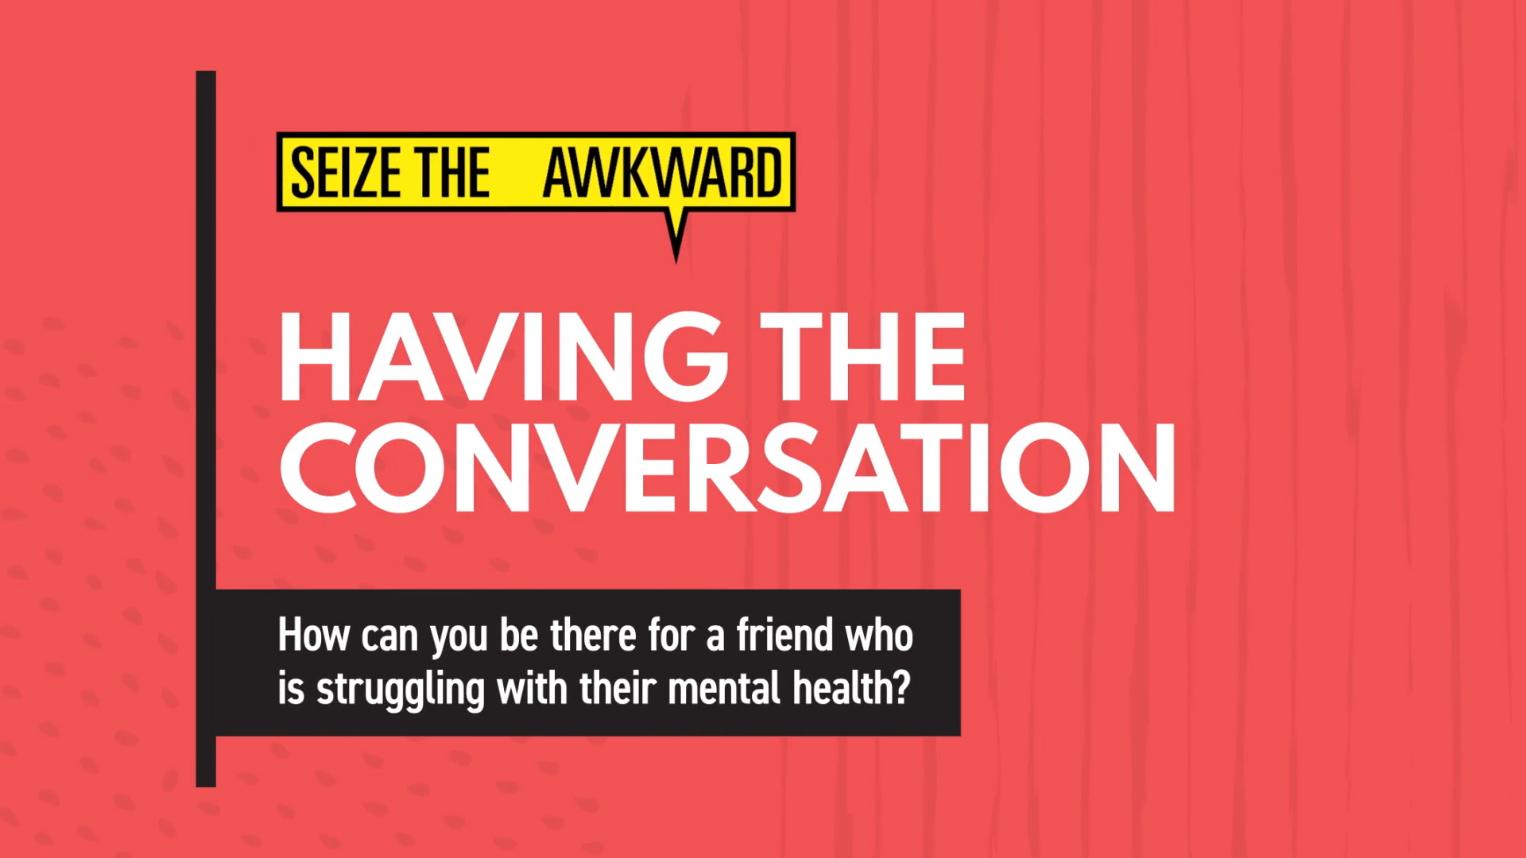 Having the Conversation